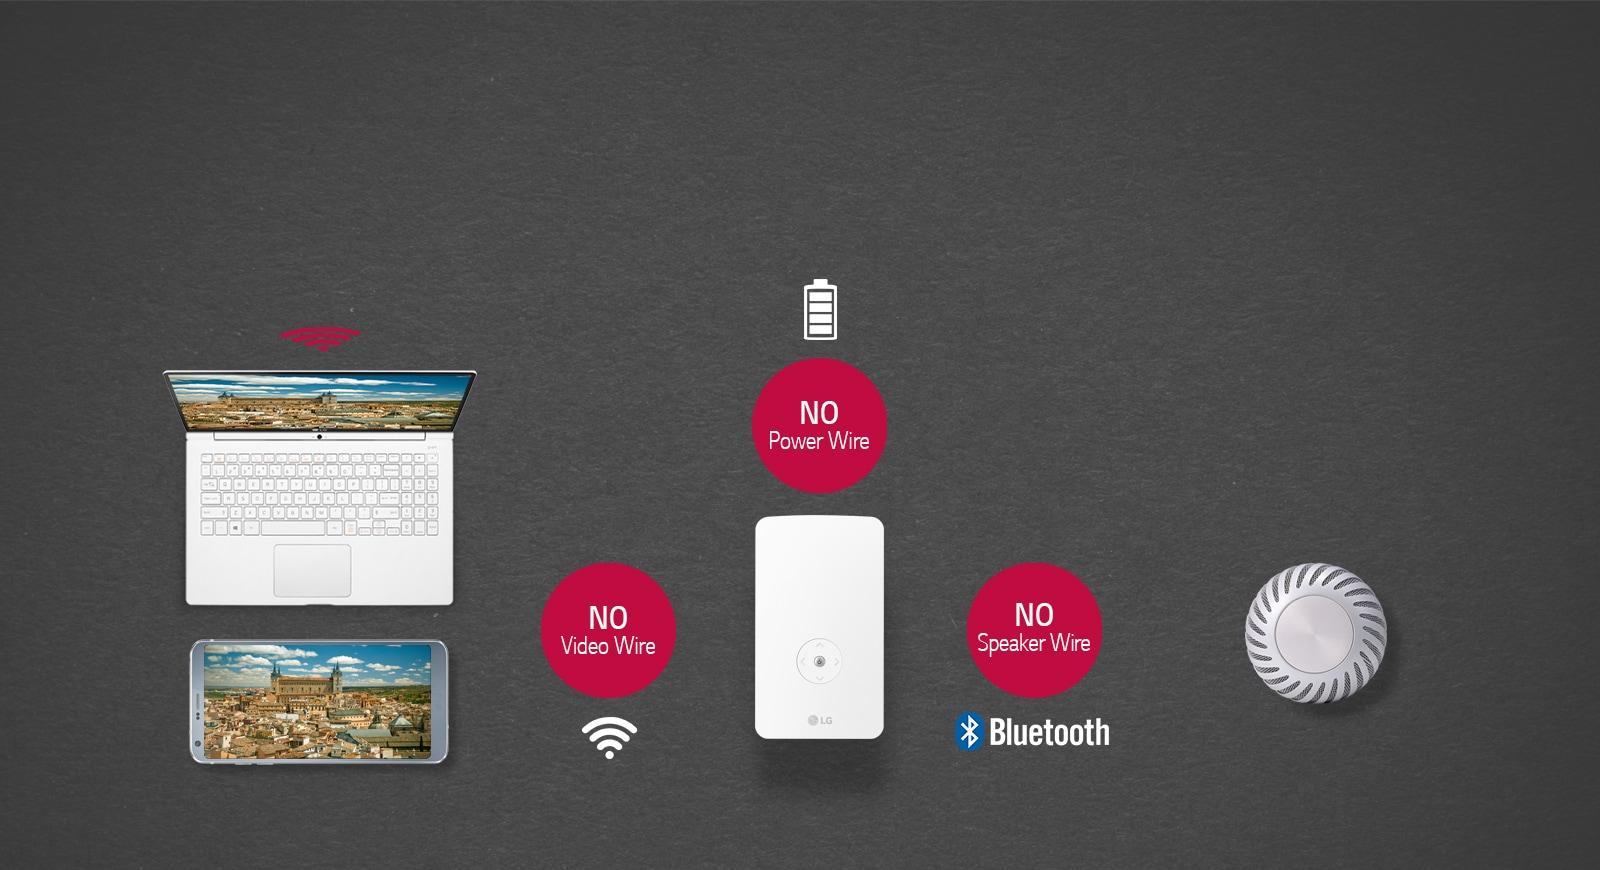 PH30JG_02_PH30JG_Triple_Wireless_20170919_D